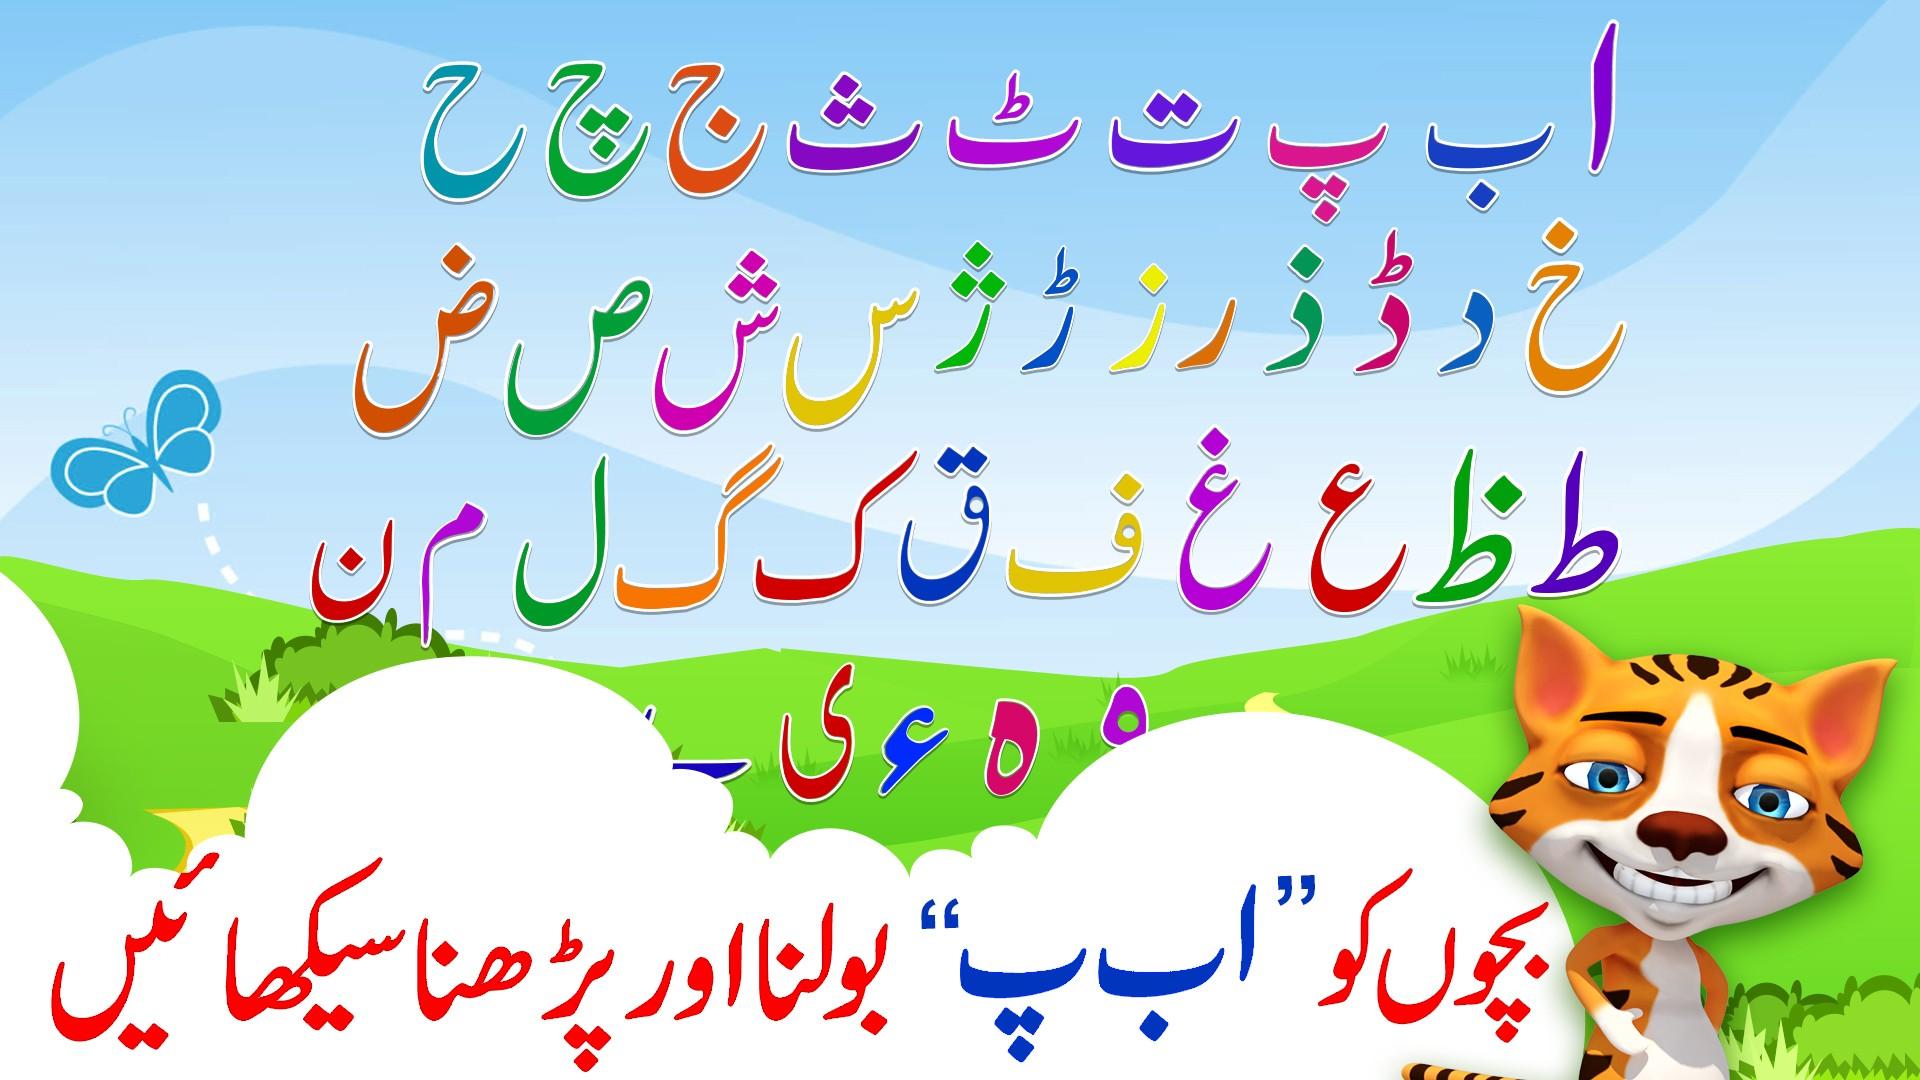 Alif Bay Pay Urdu Song for Kids